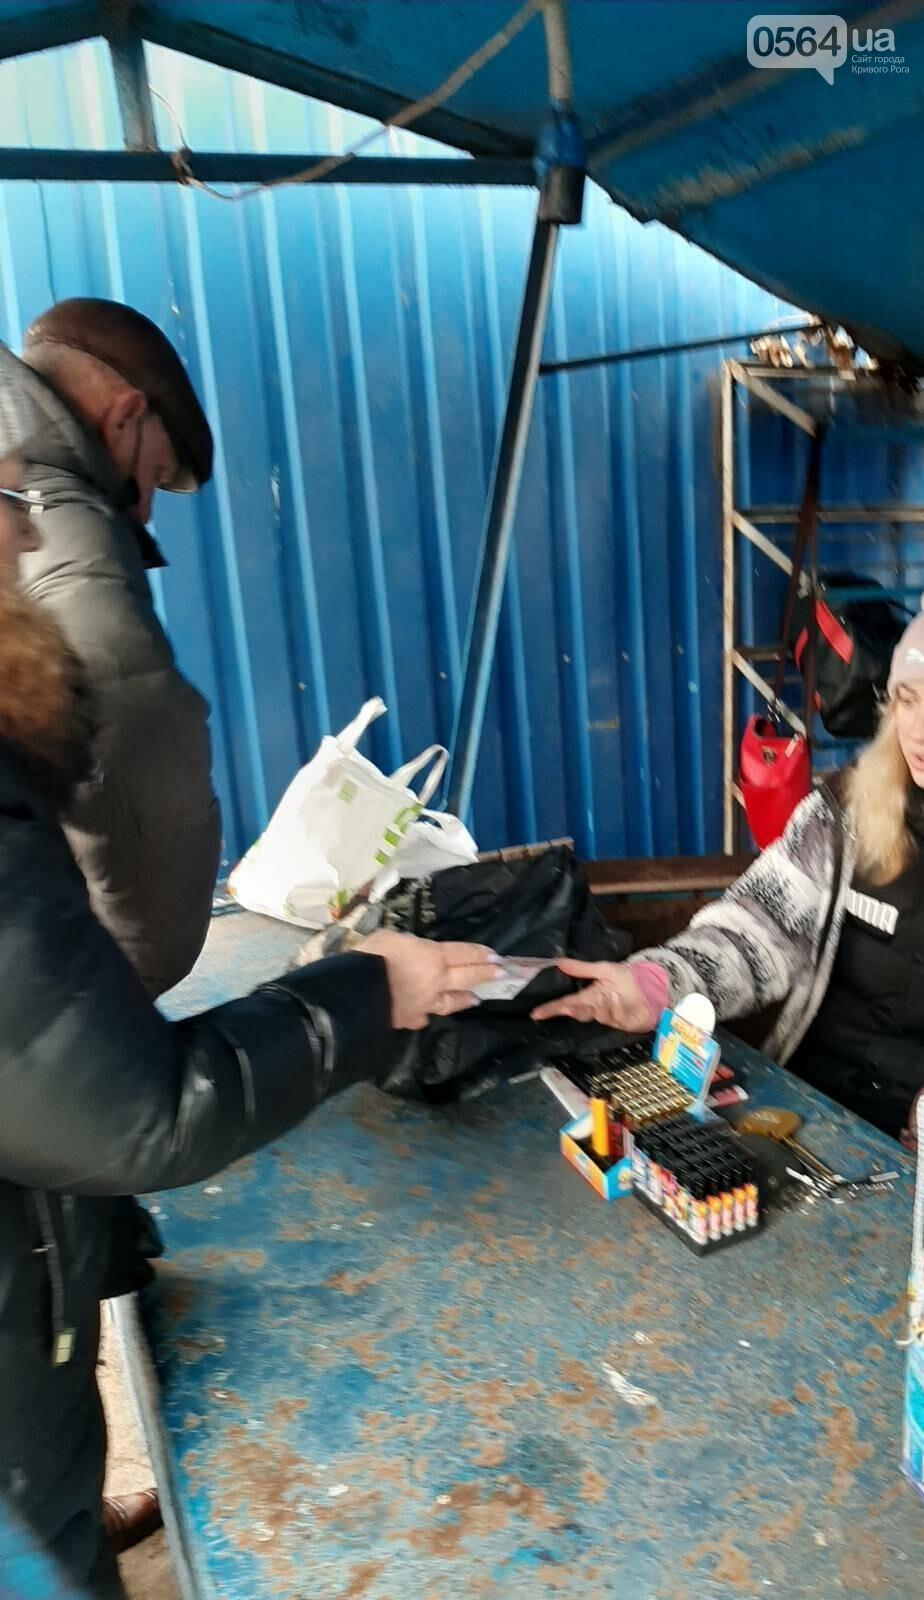 В Кривом Роге изъяли почти 500 пачек сигарет без акцизных марок, - ФОТО , фото-5